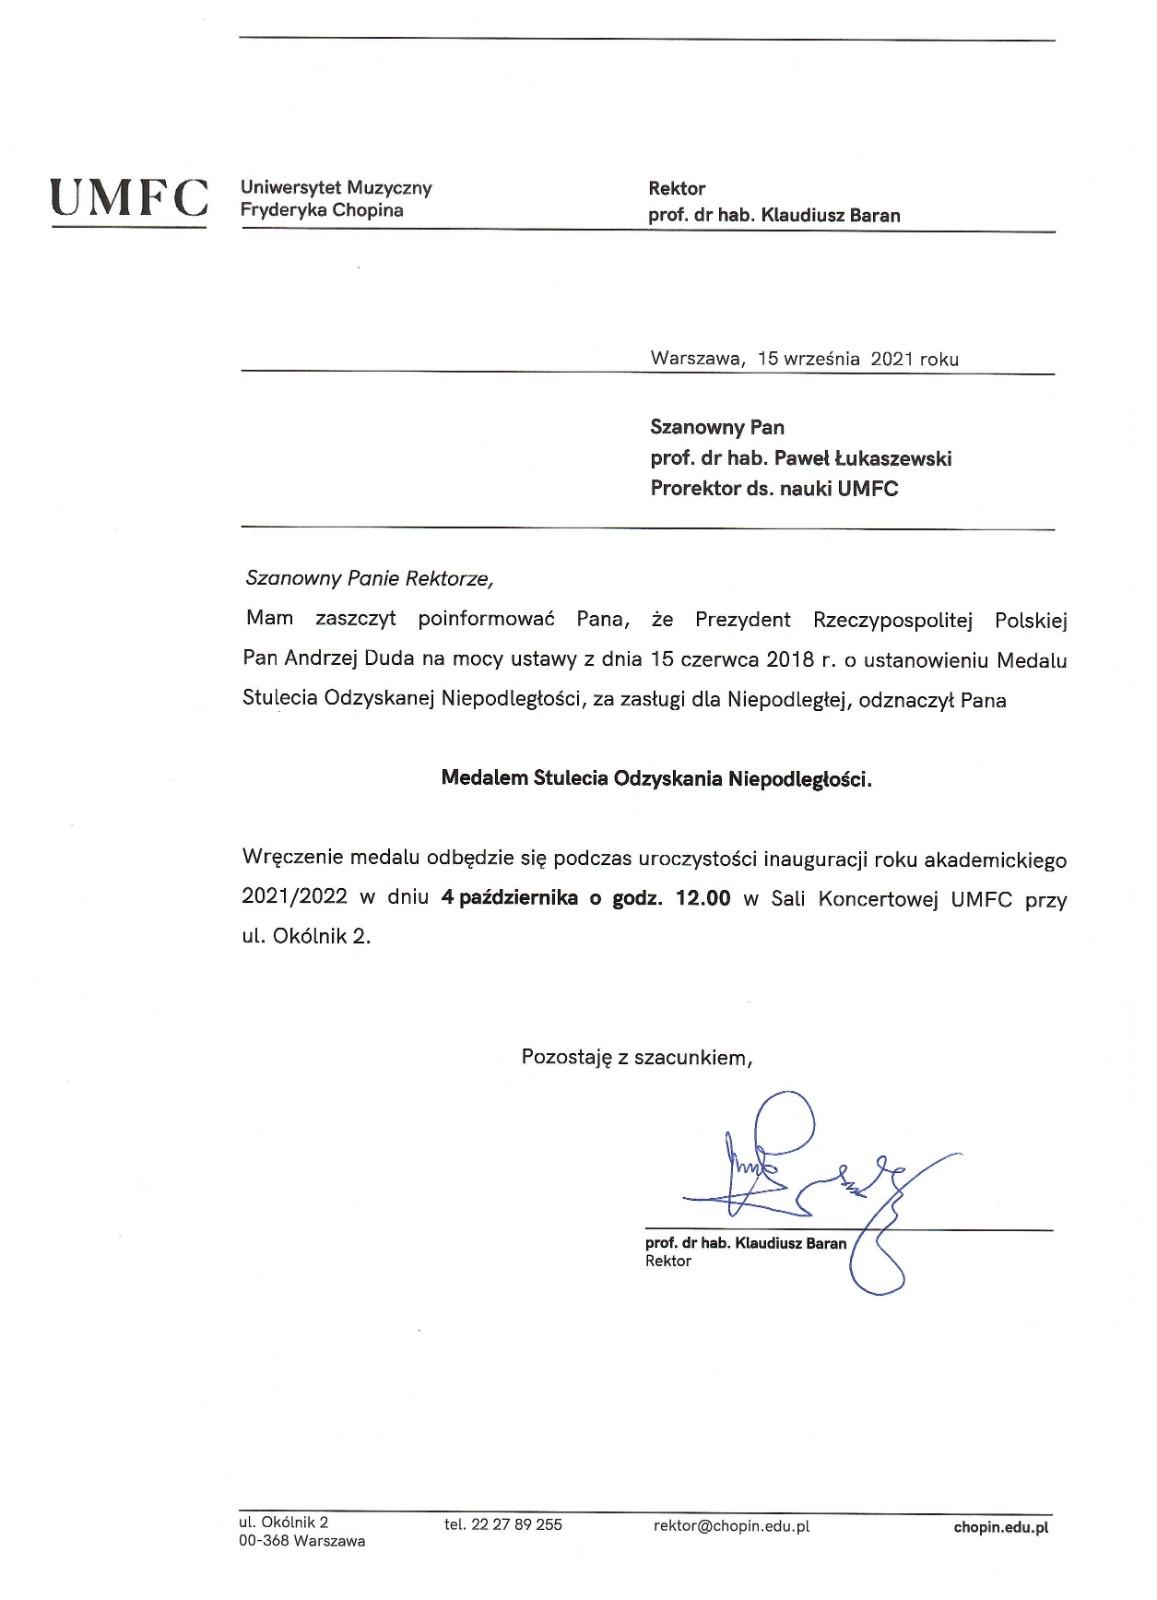 https://lukaszewski.org.uk/wp-content/uploads/2021/10/Medal-Stulecia-Odzyskania-Niepodleglosci.jpeg